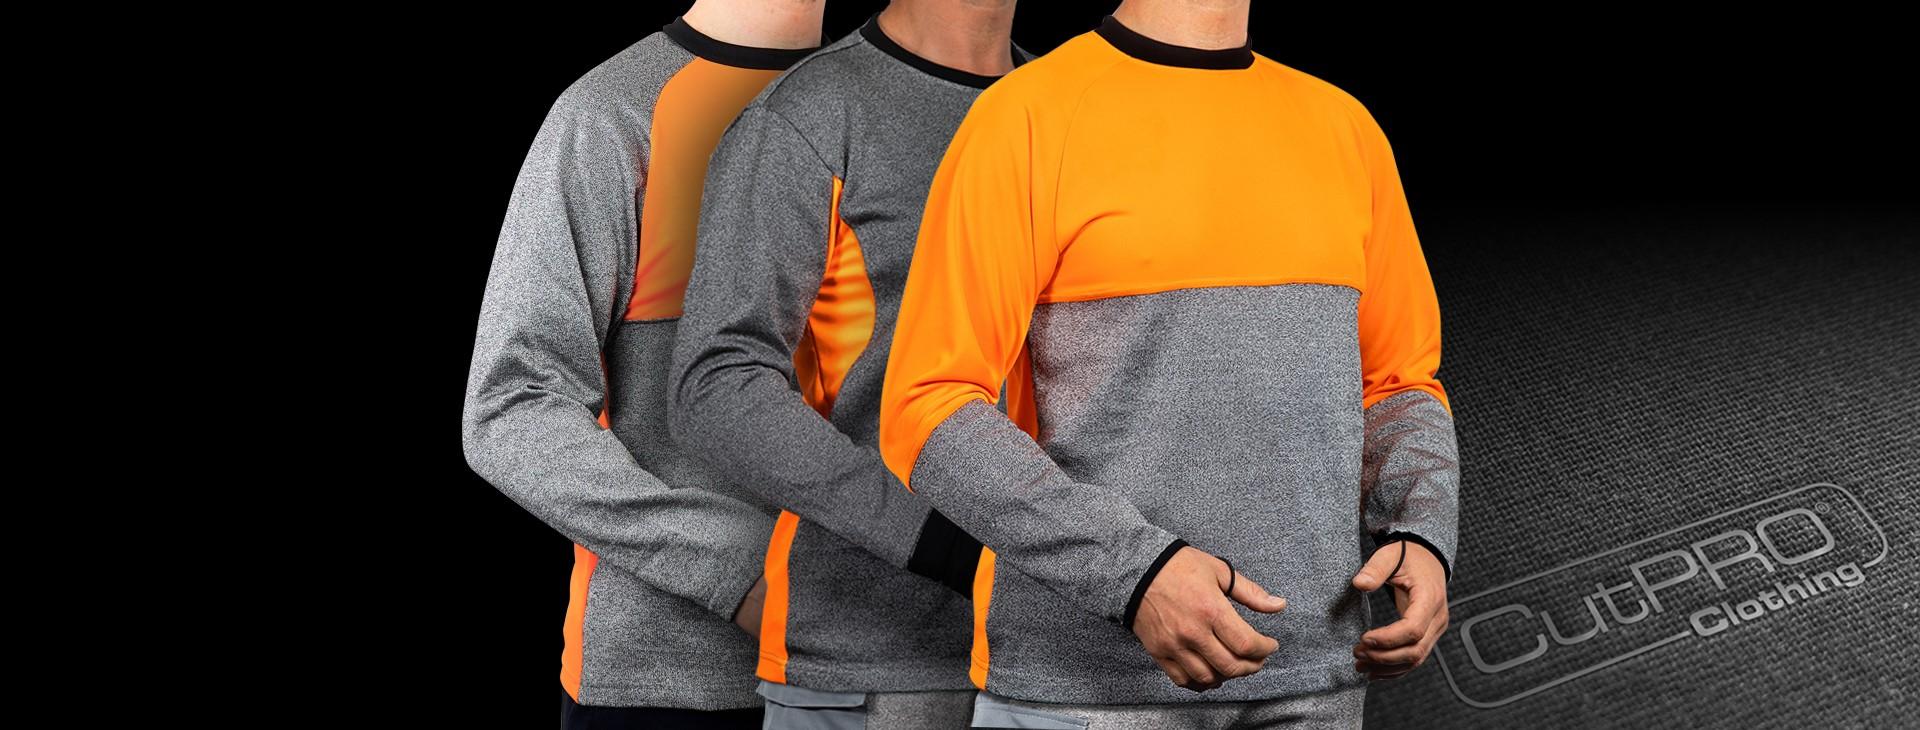 CutPRO Cut Resistant Clothing